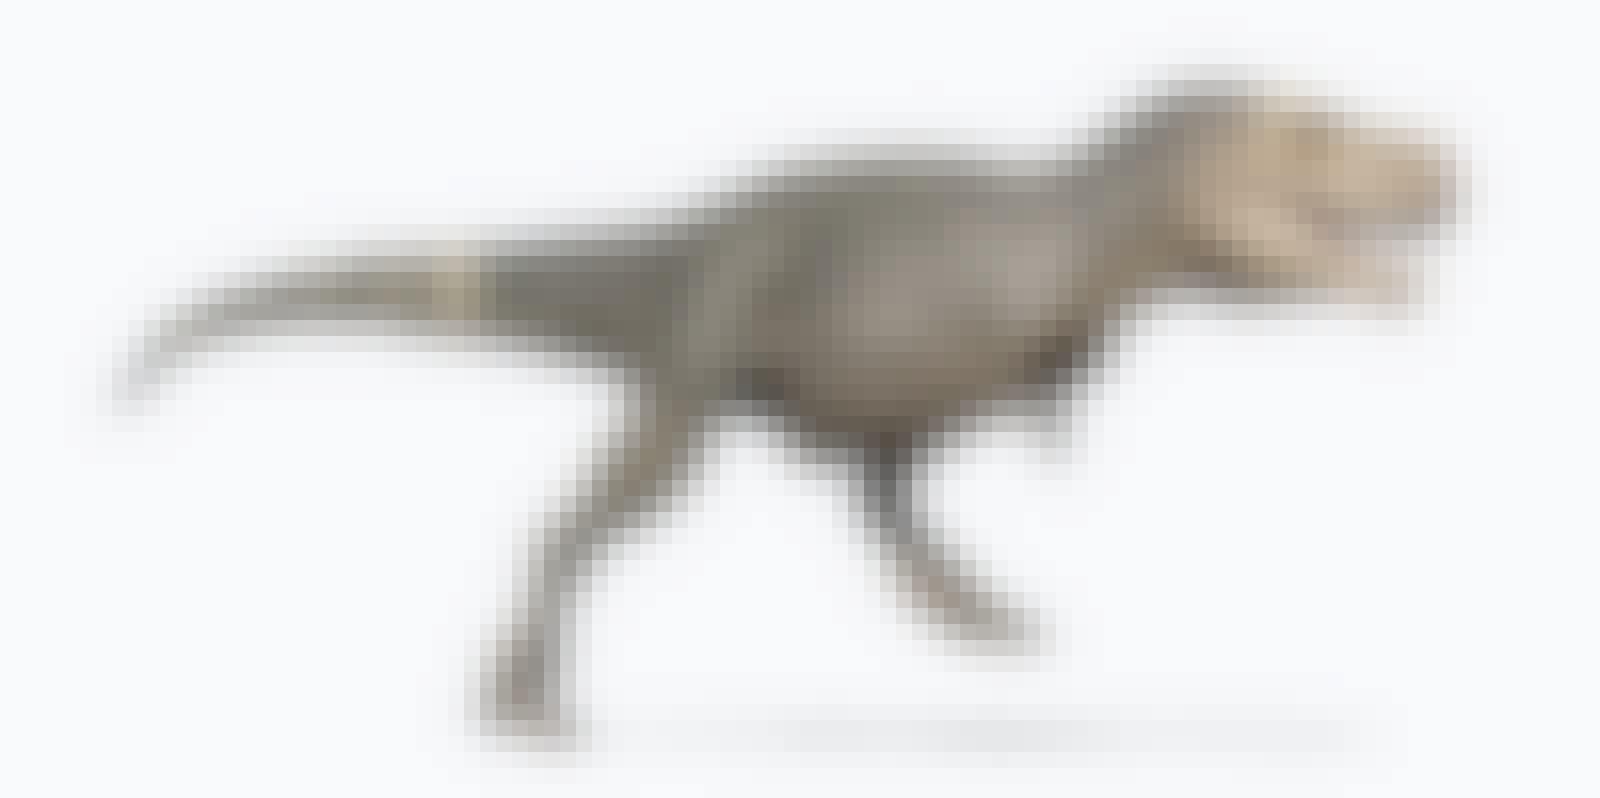 Tyrannosaurus rex rent